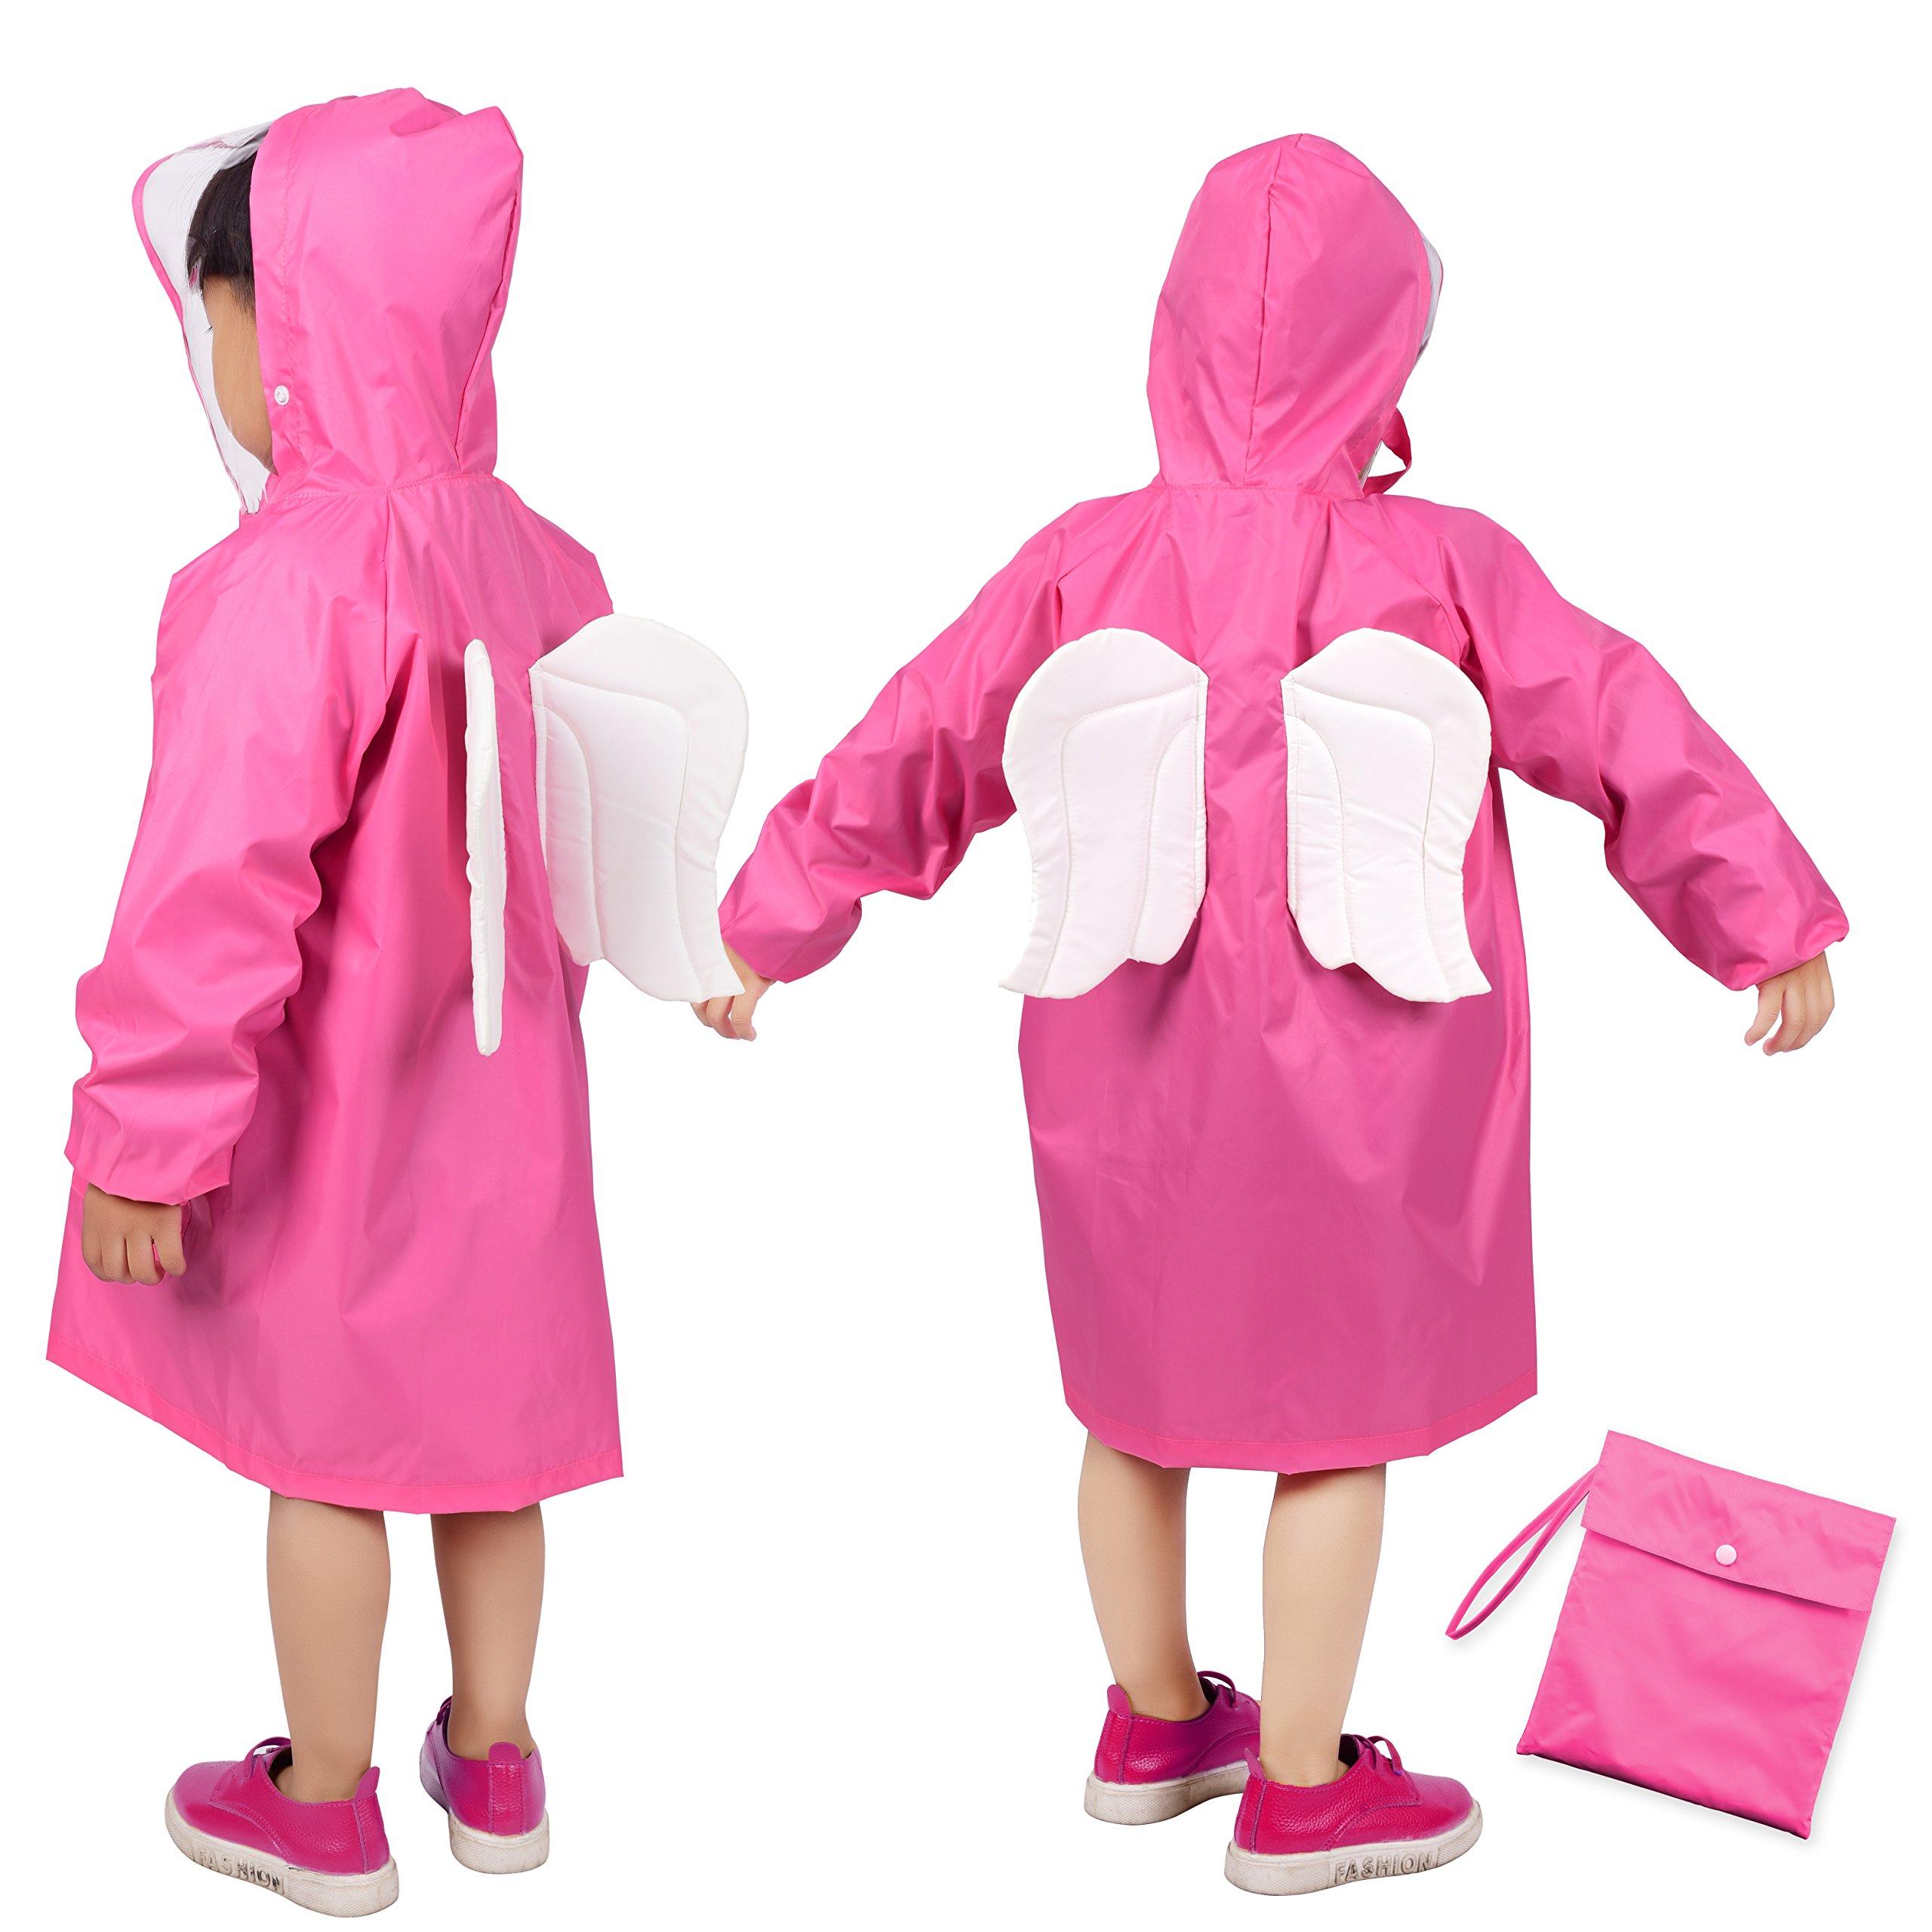 Rainbrace Kids Raincoat, Children Carton Waterproof Hooded Rain Poncho Age 6-12